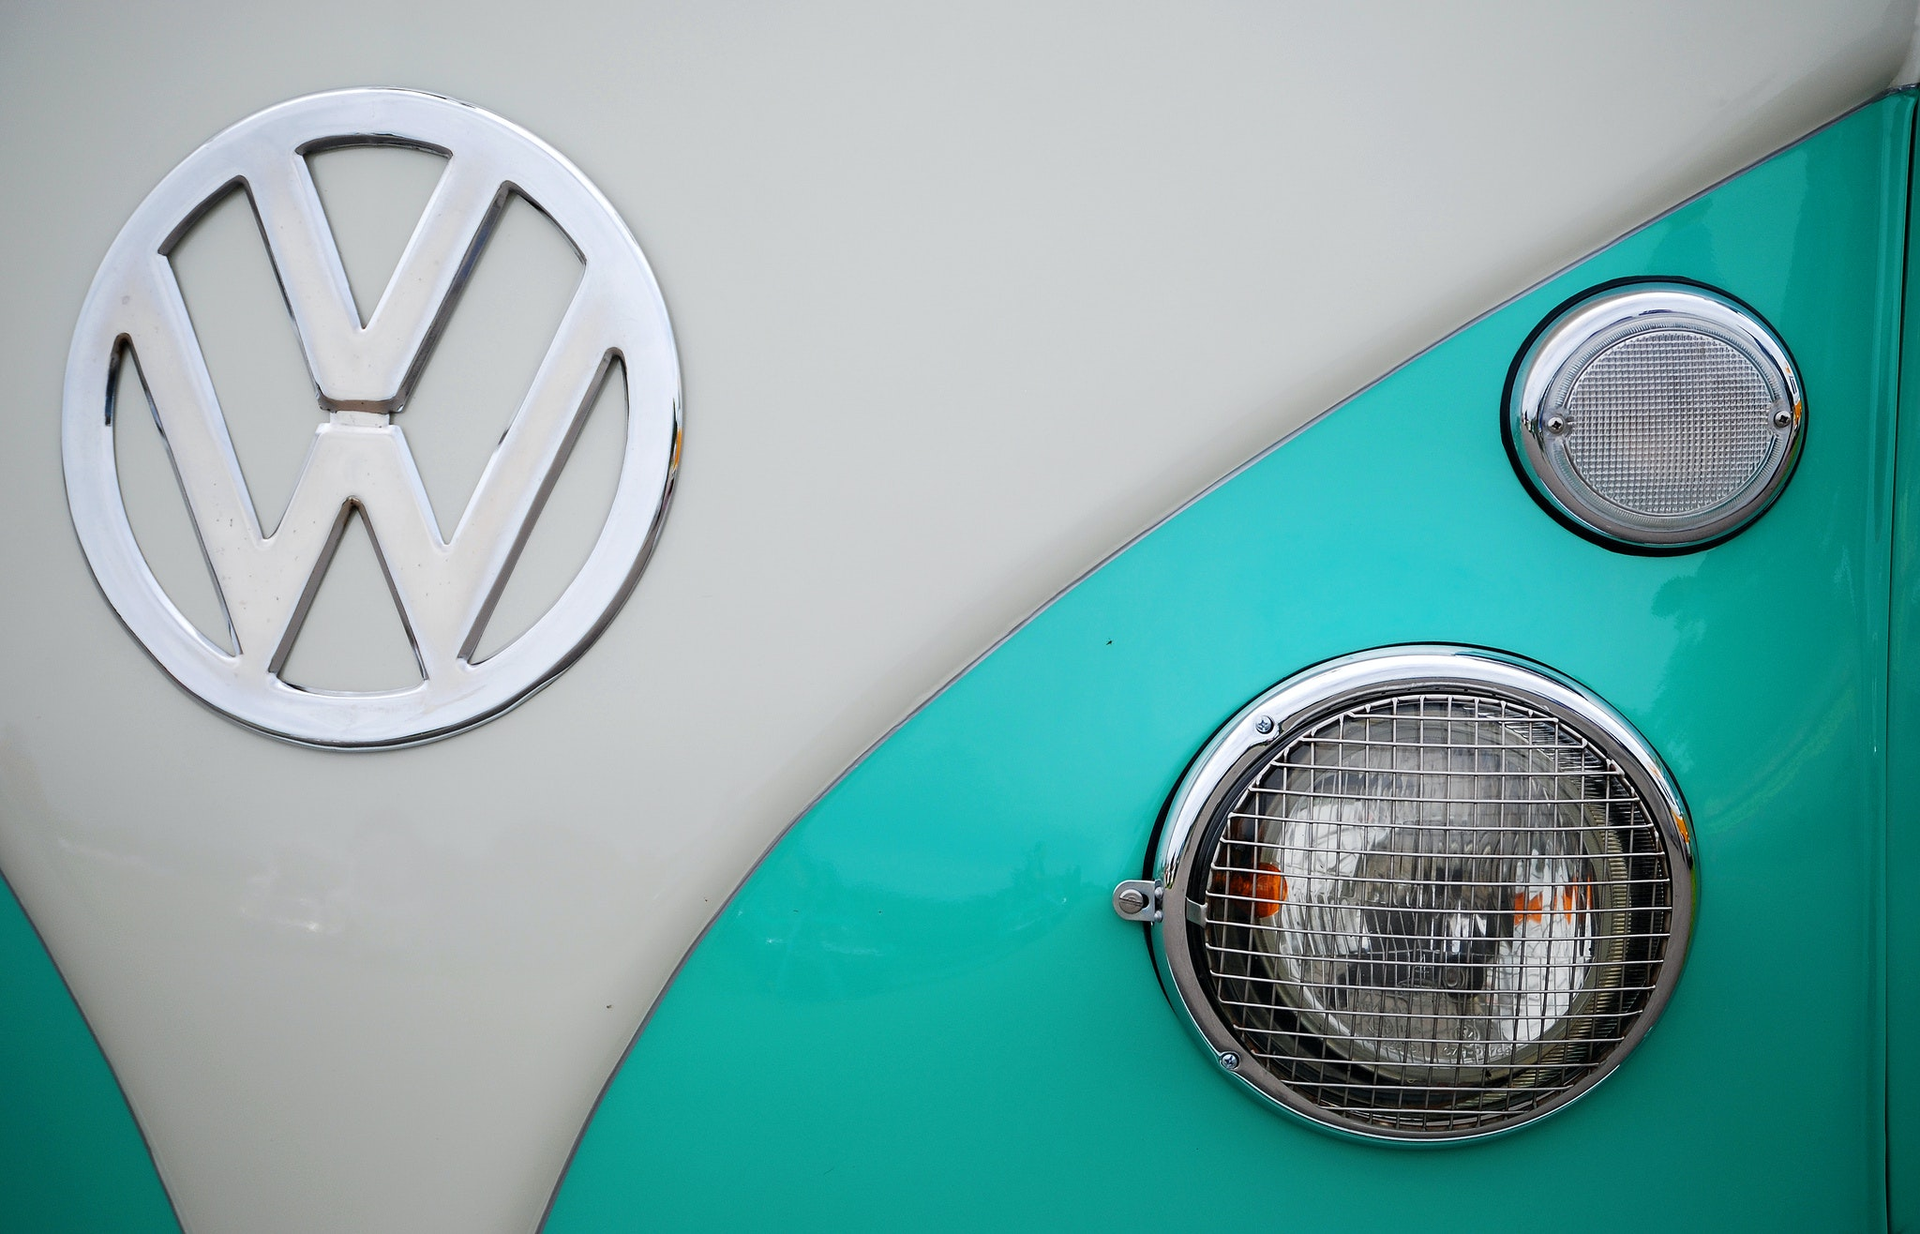 Vorsprung durch realpolitik – what VW power games say about German CEO culture